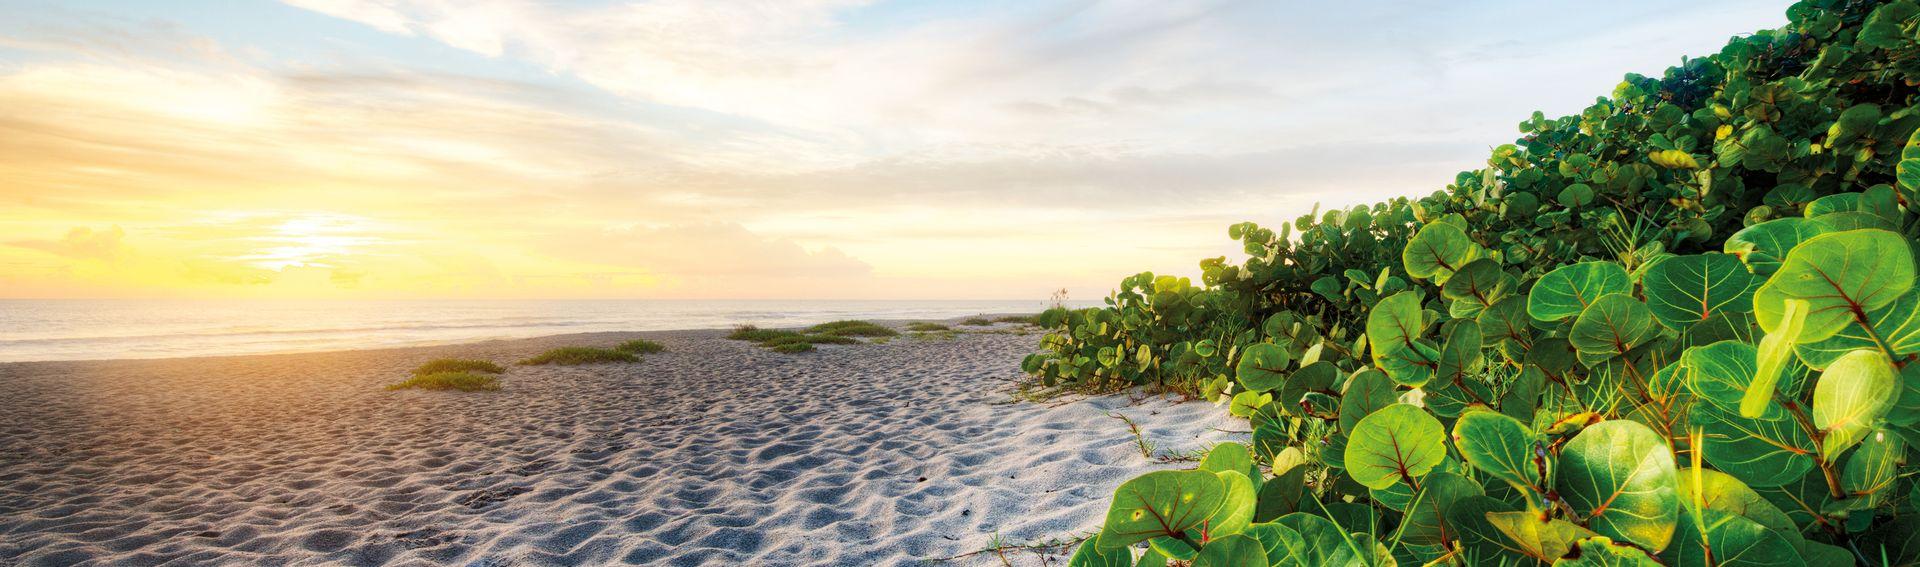 North Florida Beaches